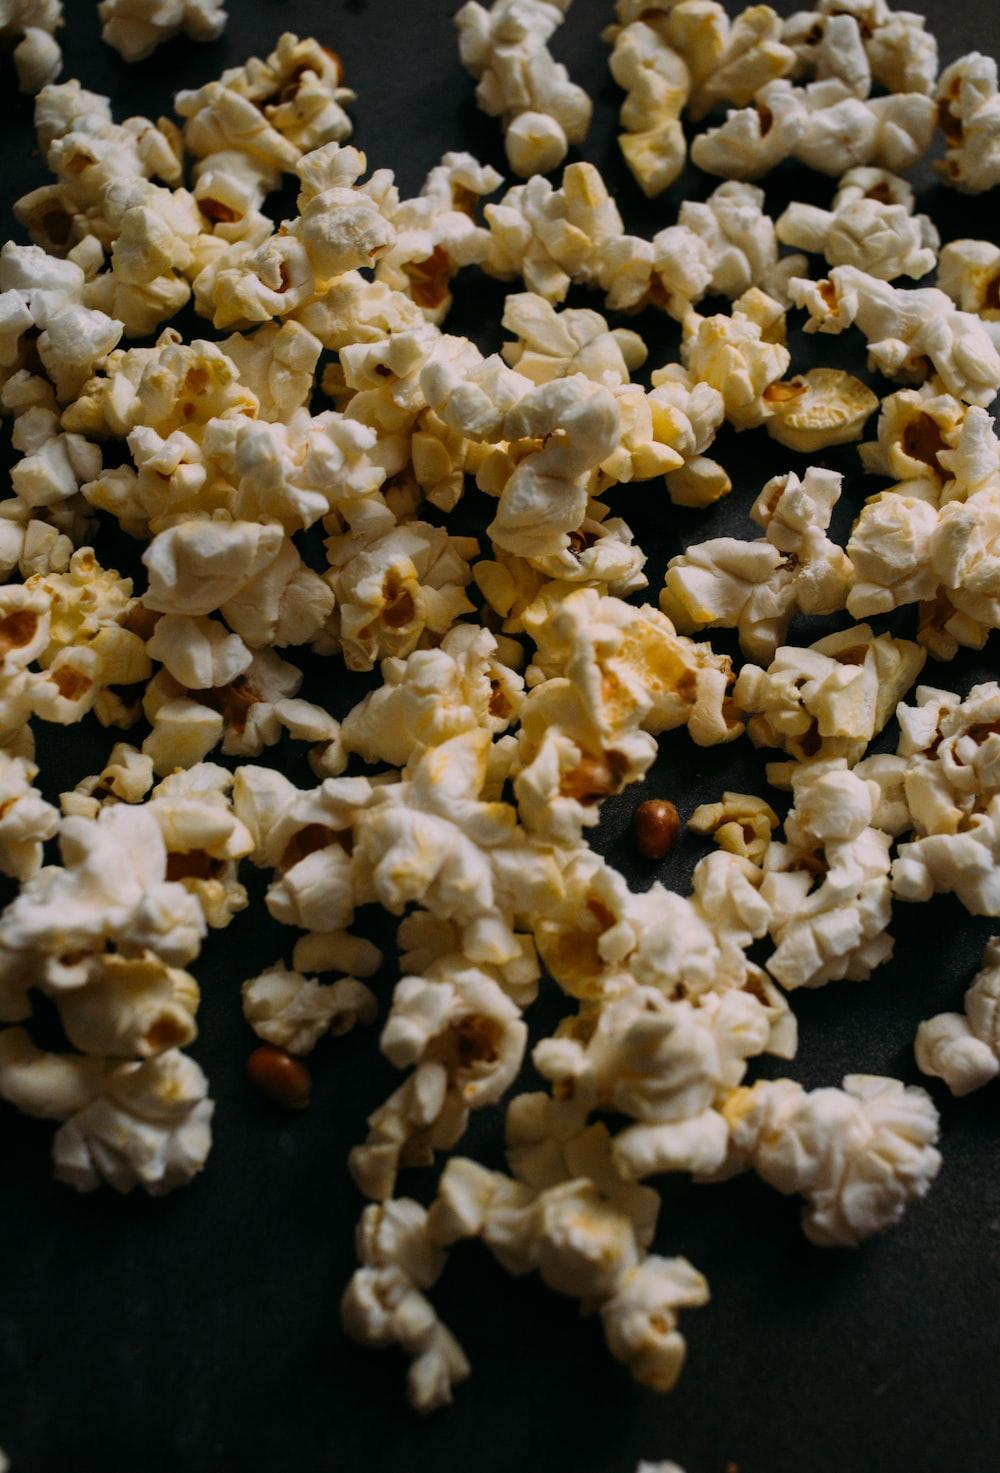 photo of popcorn